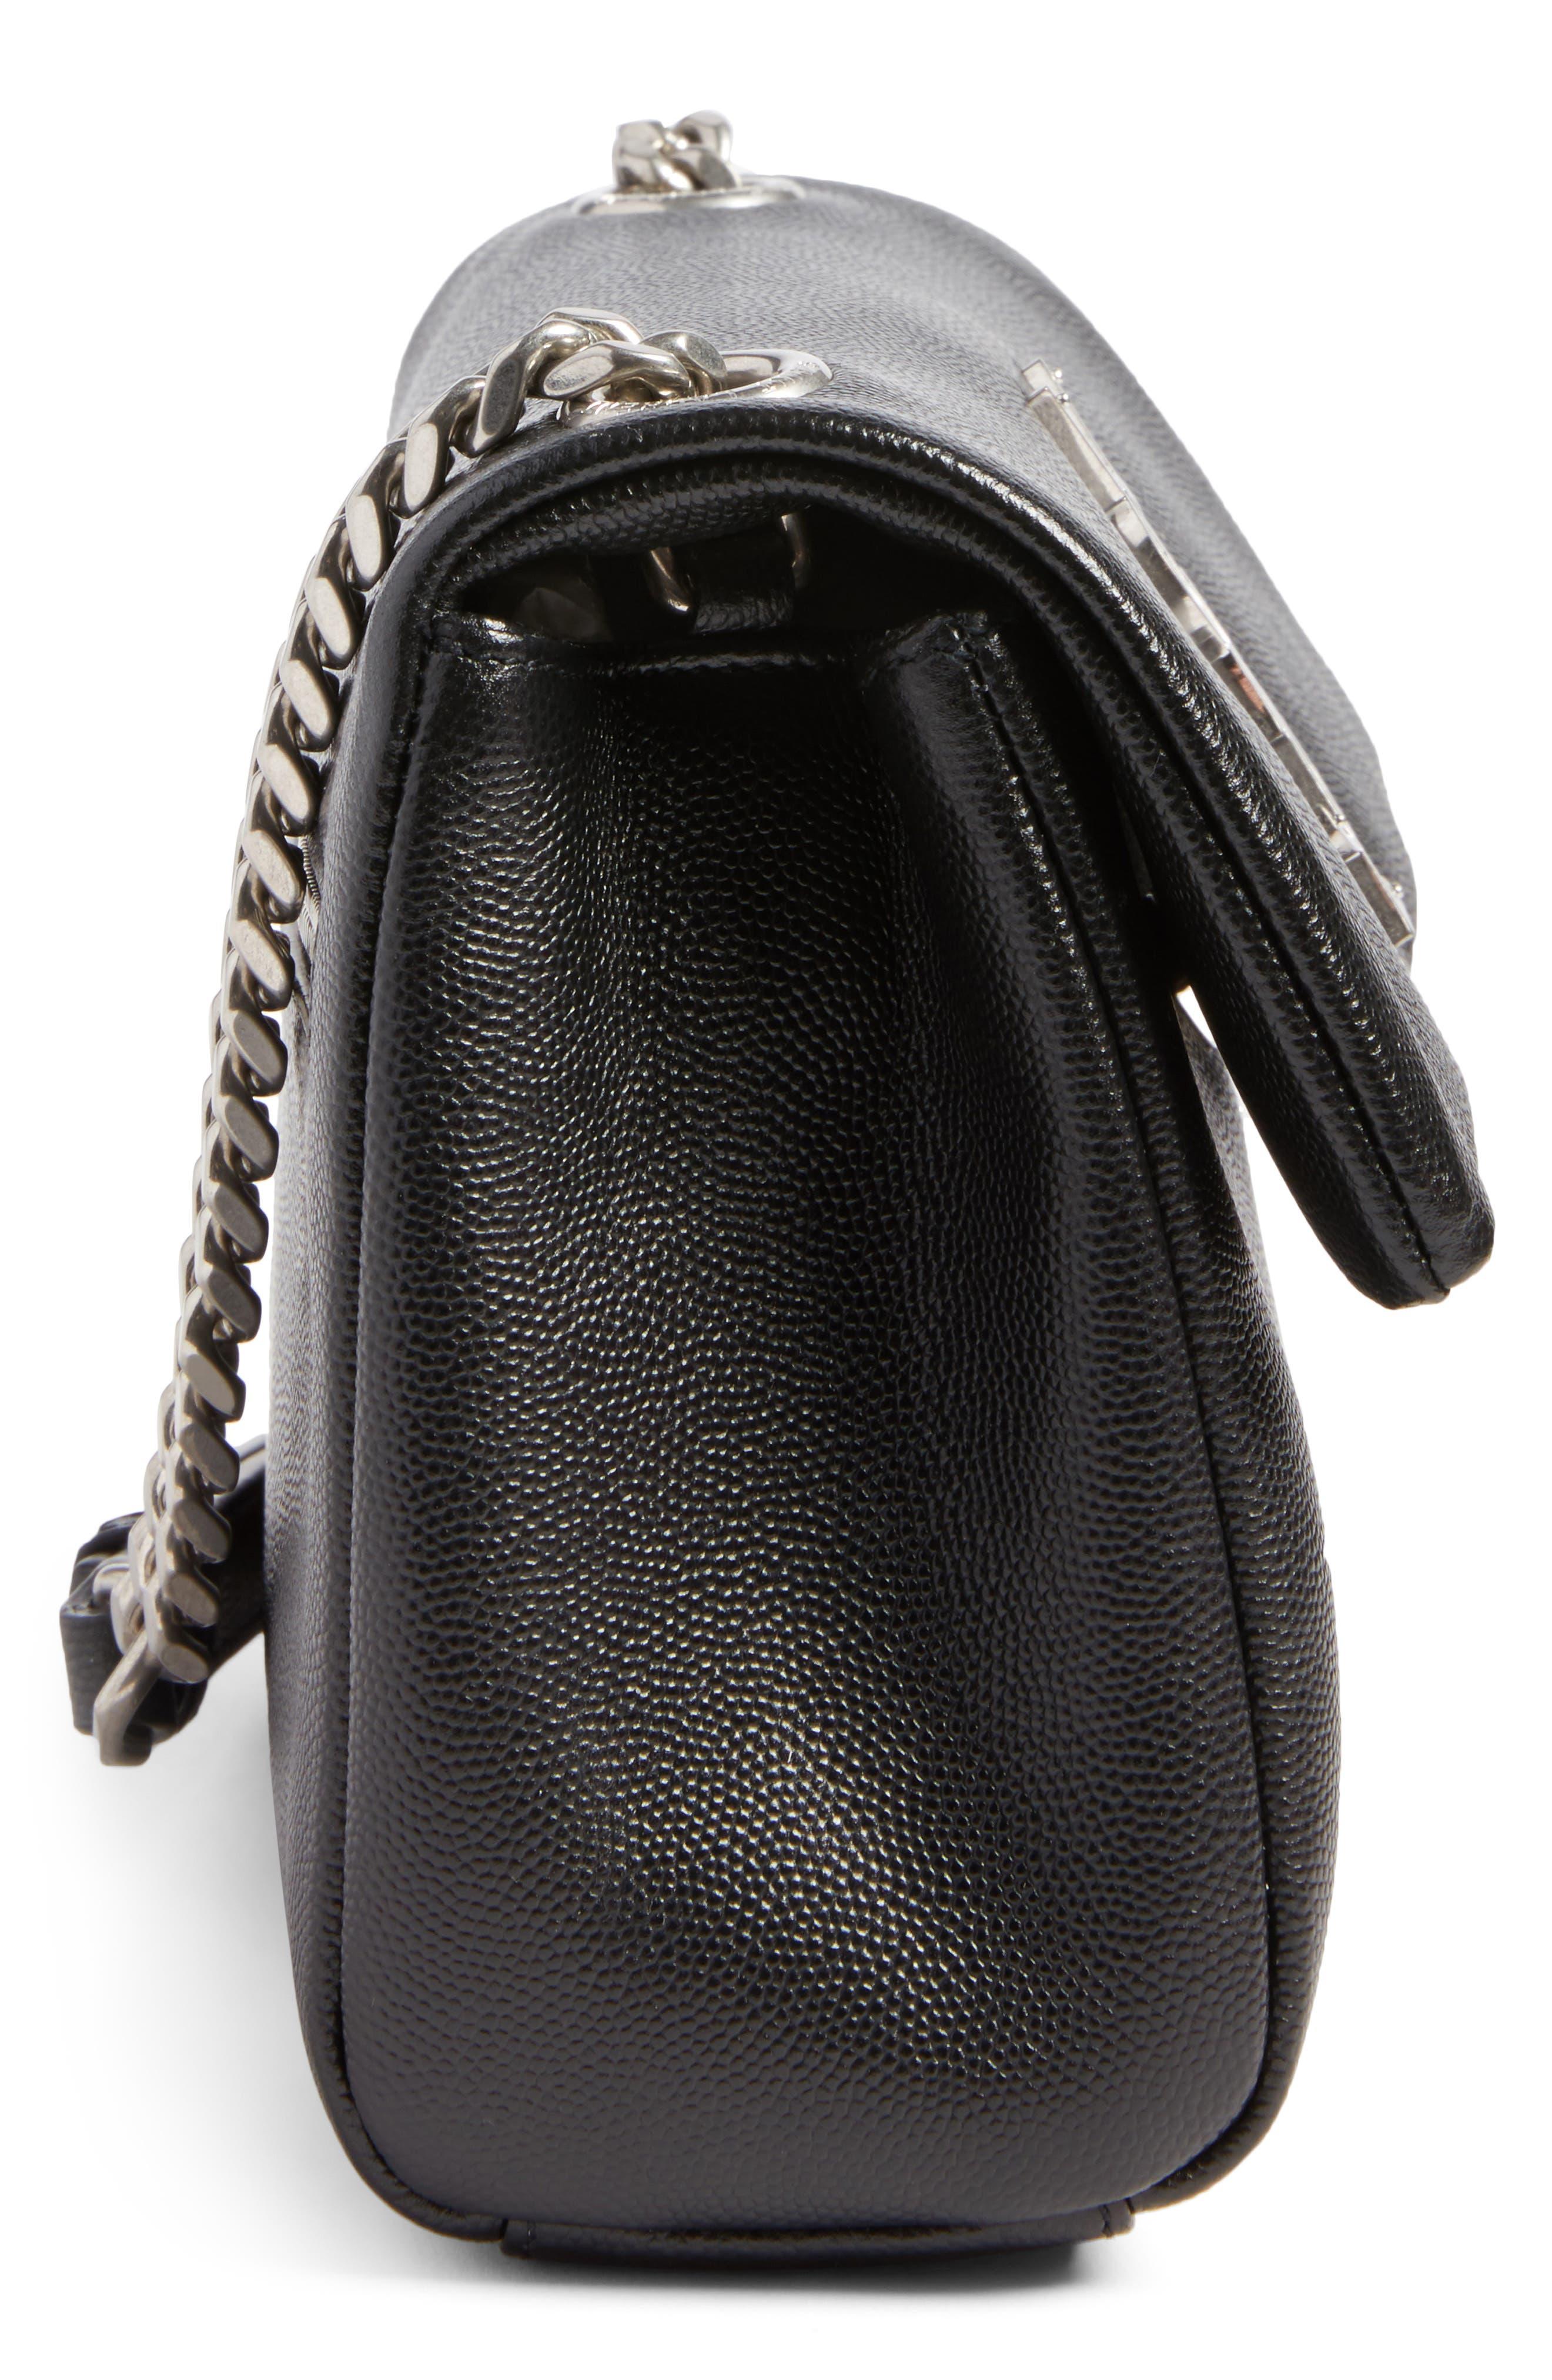 West Hollywood Calfskin Leather Messenger Bag,                             Alternate thumbnail 16, color,